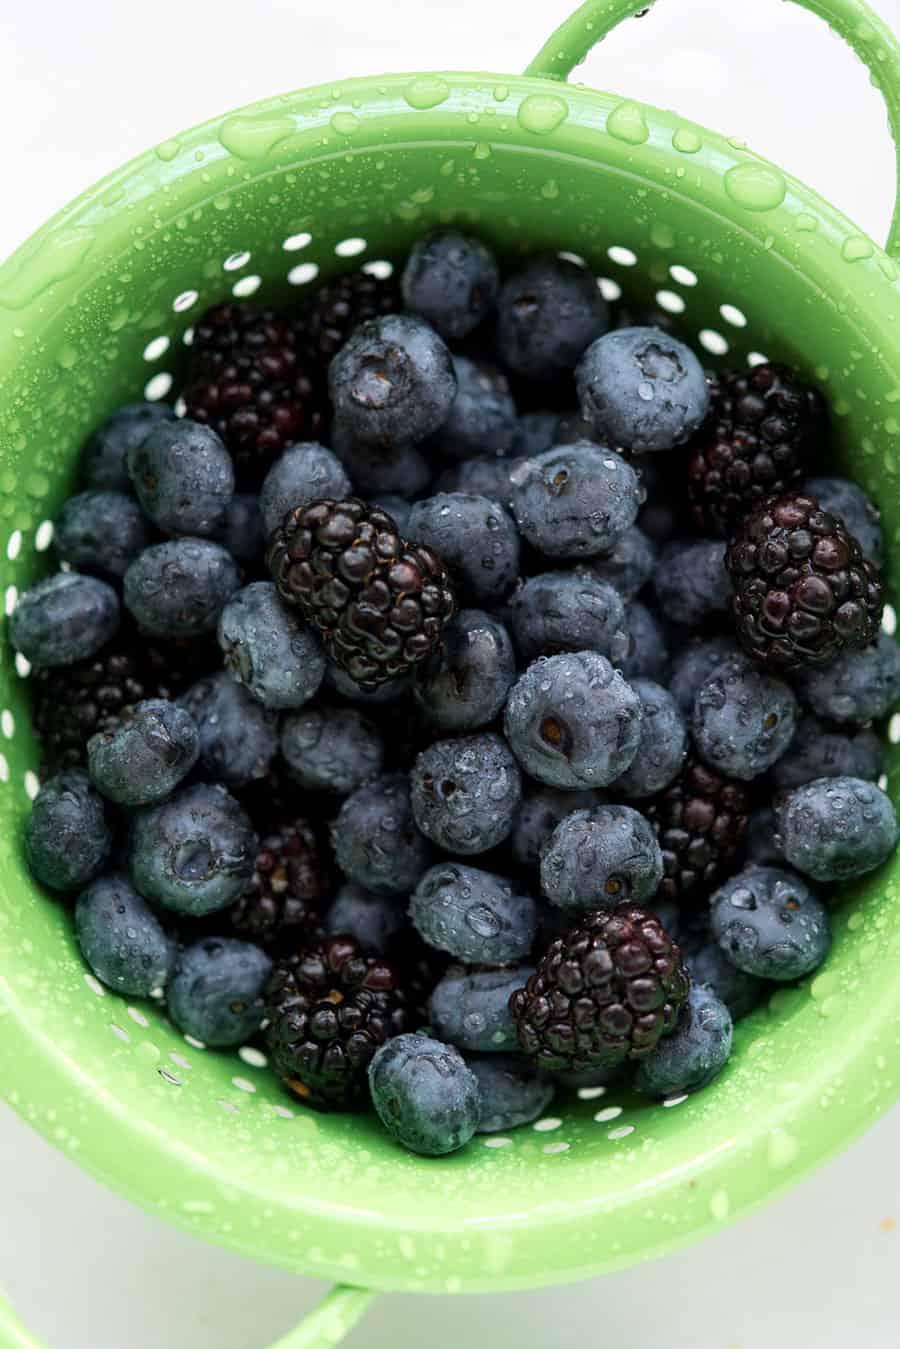 No-Bake Berry Cheesecake Bowls! Easy, quick and delicious. #vegan #soyfree #glutenfree @VeganYackAttack